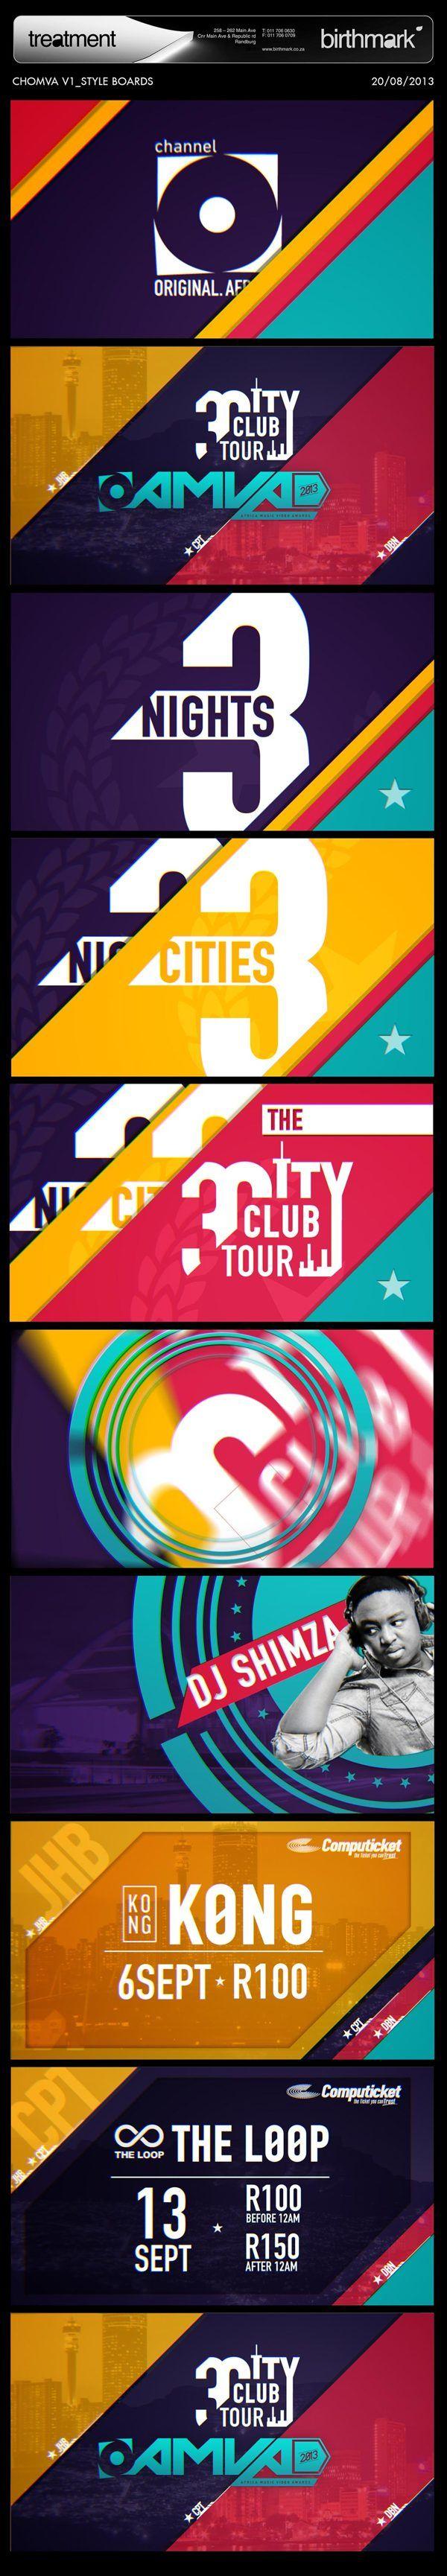 https://www.behance.net/gallery/11839381/CHOAMVA-3-CITY-TOUR